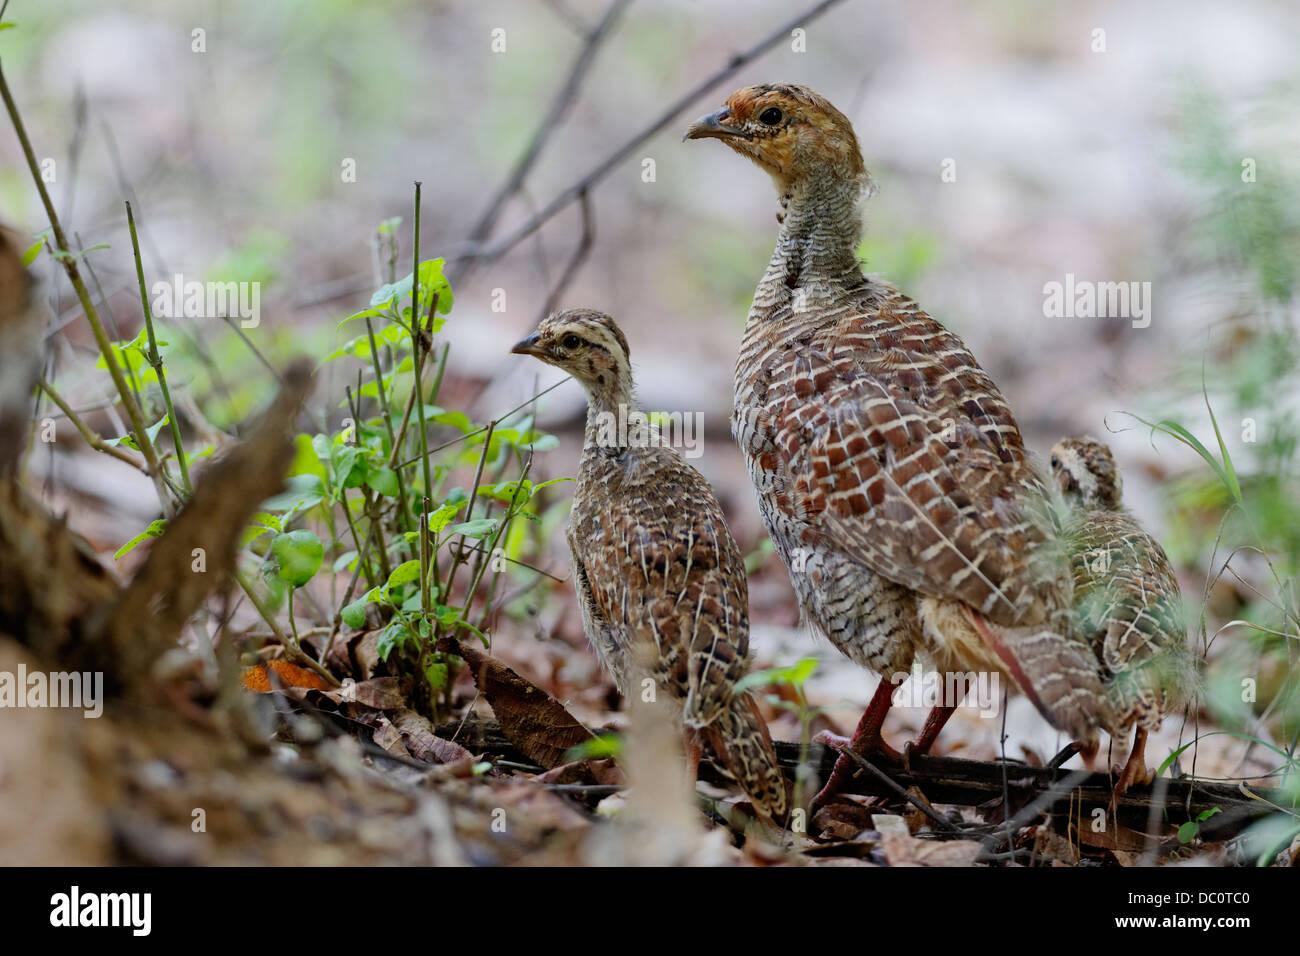 Grey Francolin Partridges (Francolinus pondicerianus) at Ranthambhore National Park, Rajasthan, India. - Stock Image